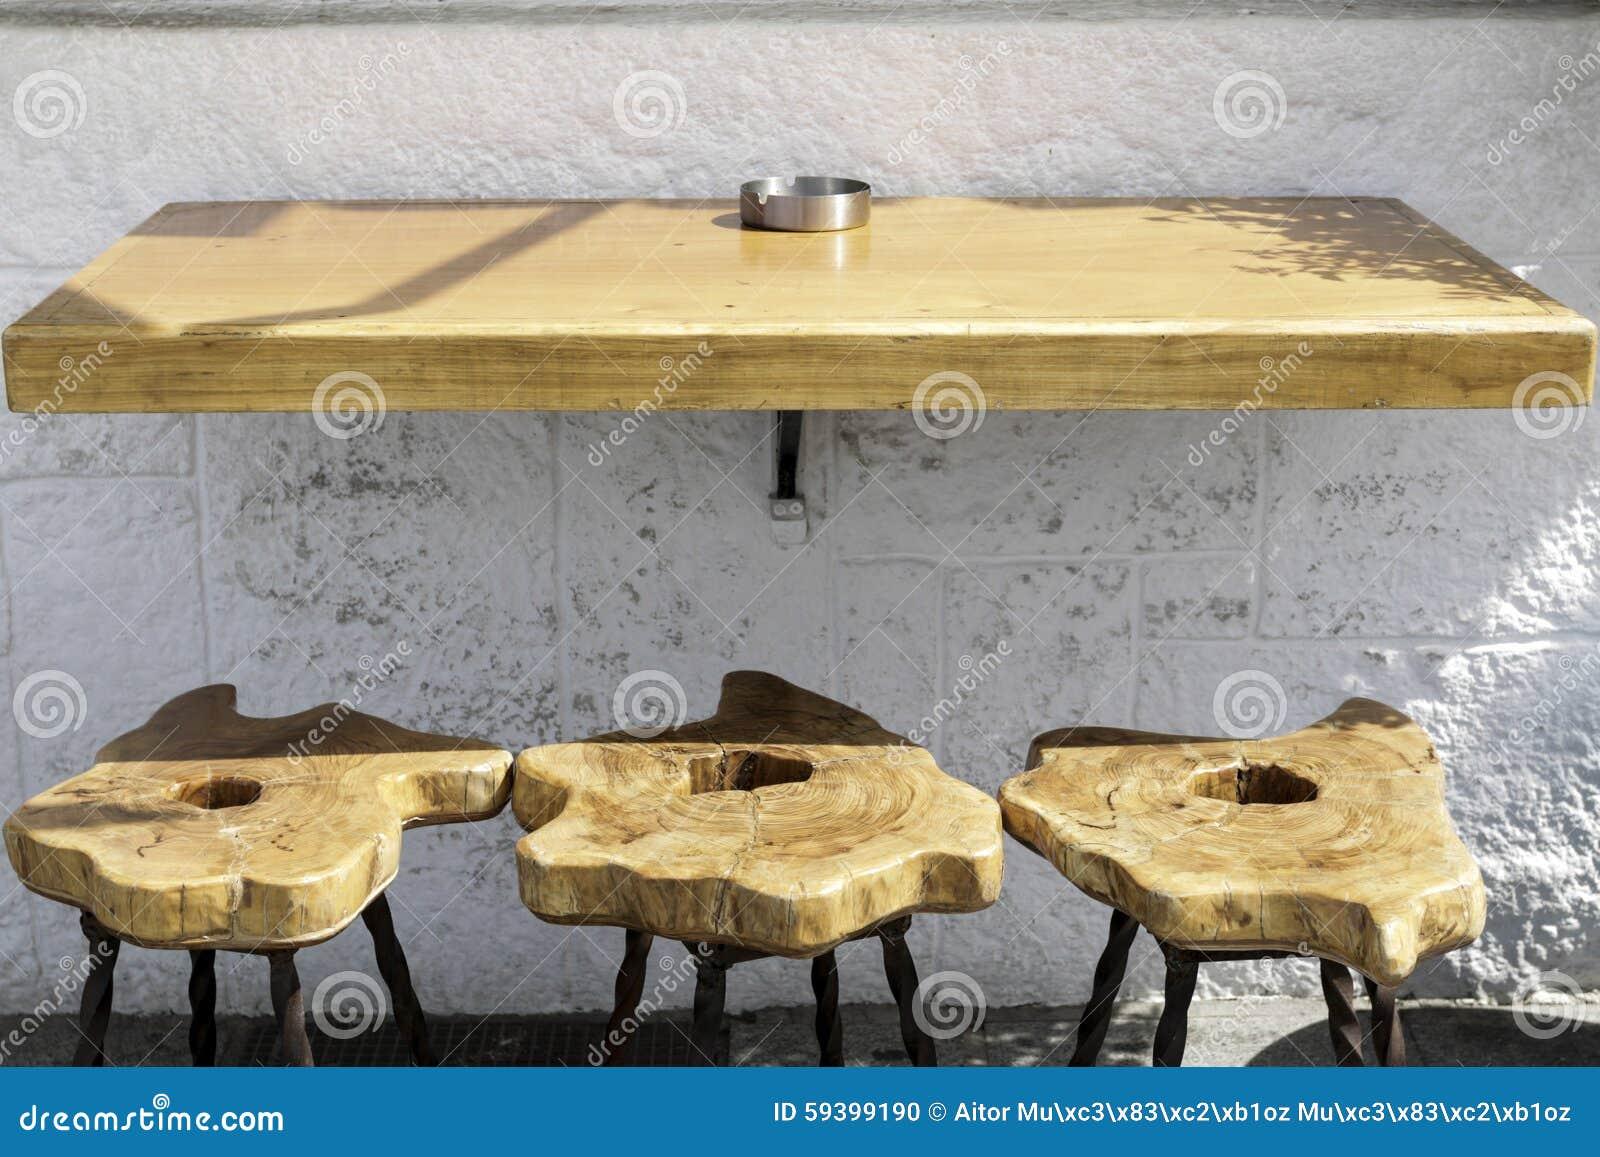 Dagoba u tavolo artigianale da pic nic u studiosuperfluo